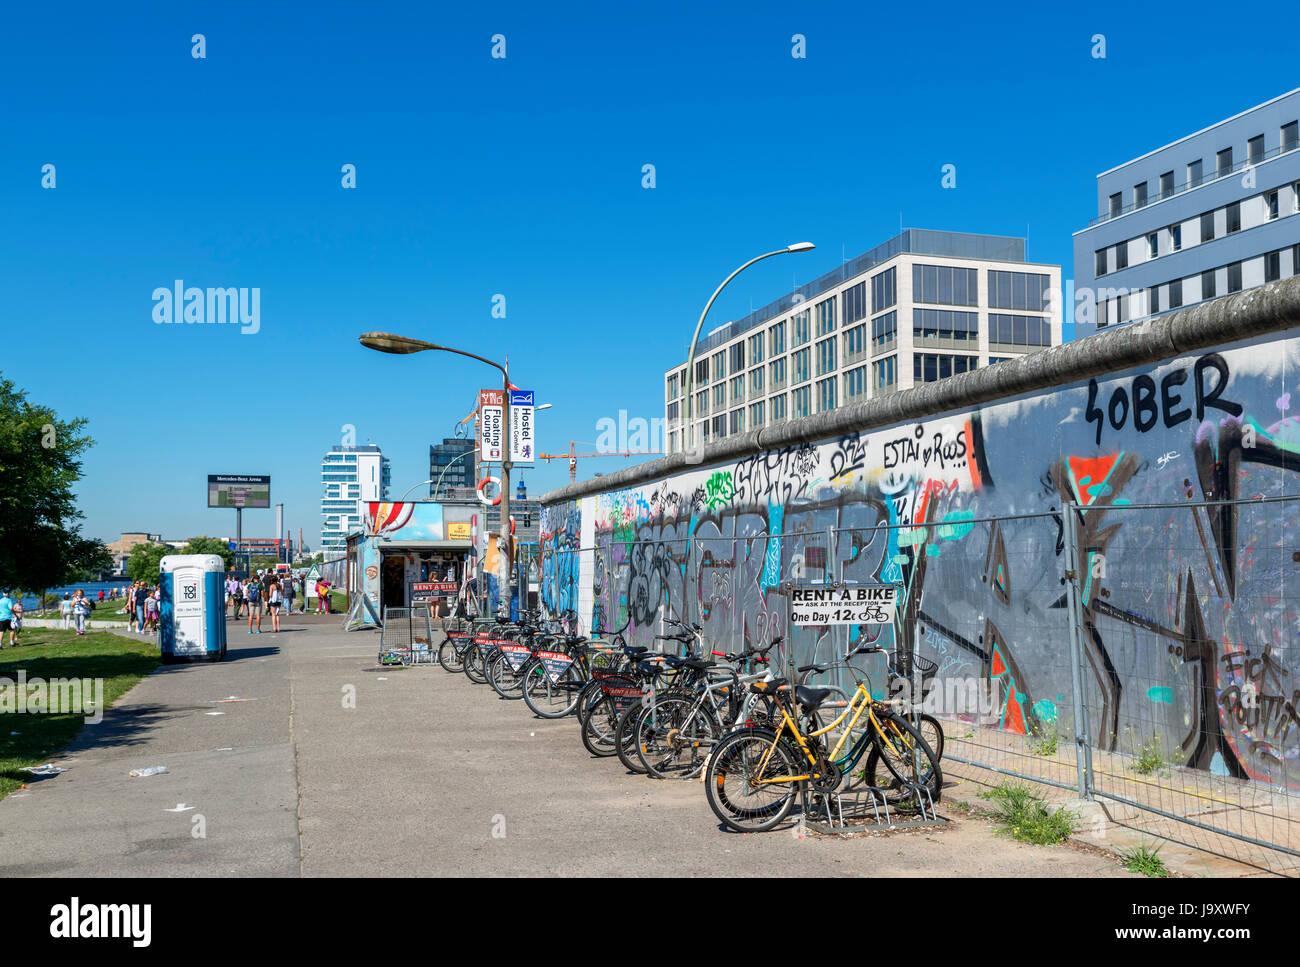 Bike rental by a section of the Berlin Wall at the East Side Gallery, Friedrichshain-Kreuzberg, Berlin, Germany - Stock Image